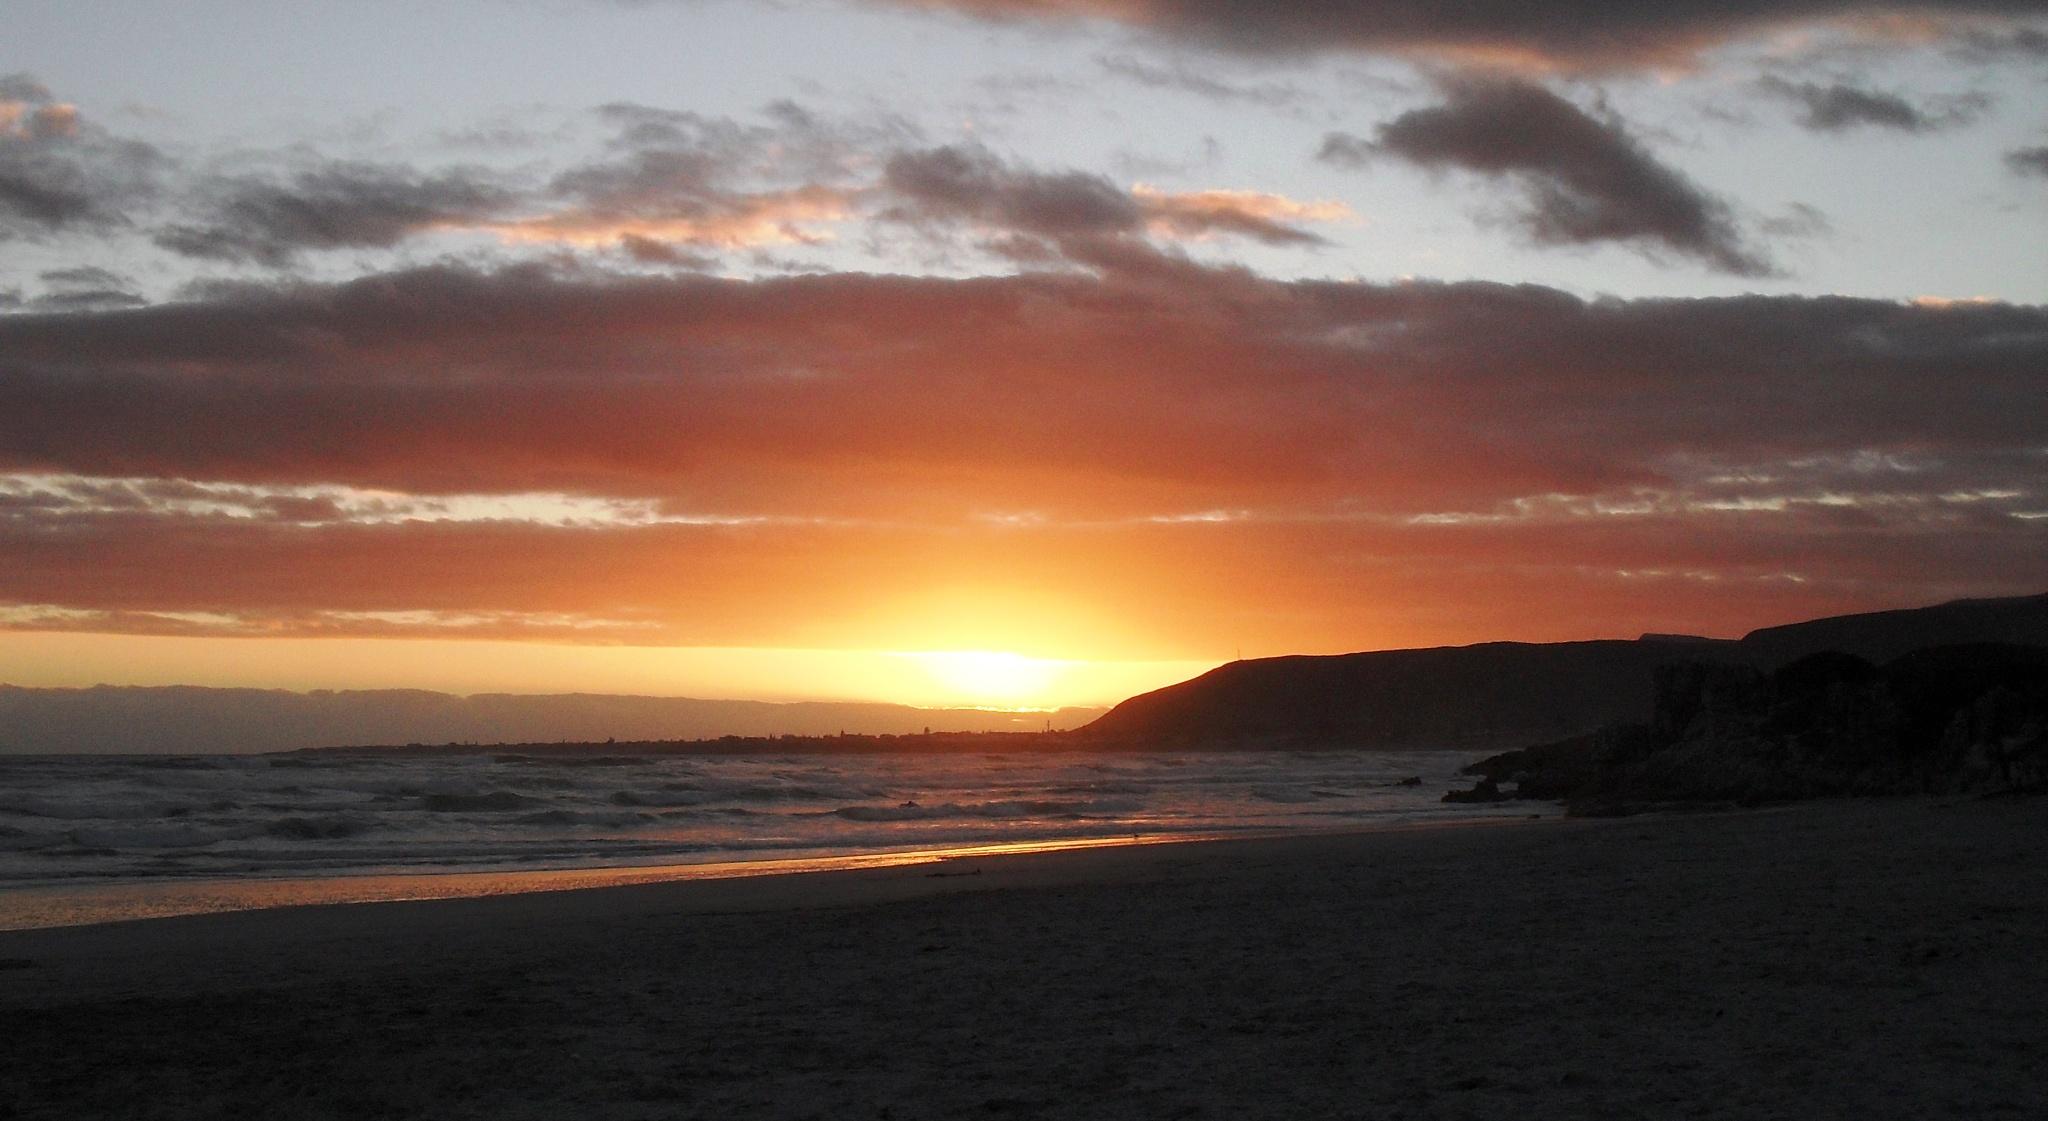 West Coast sunset. by Japie van der Berg